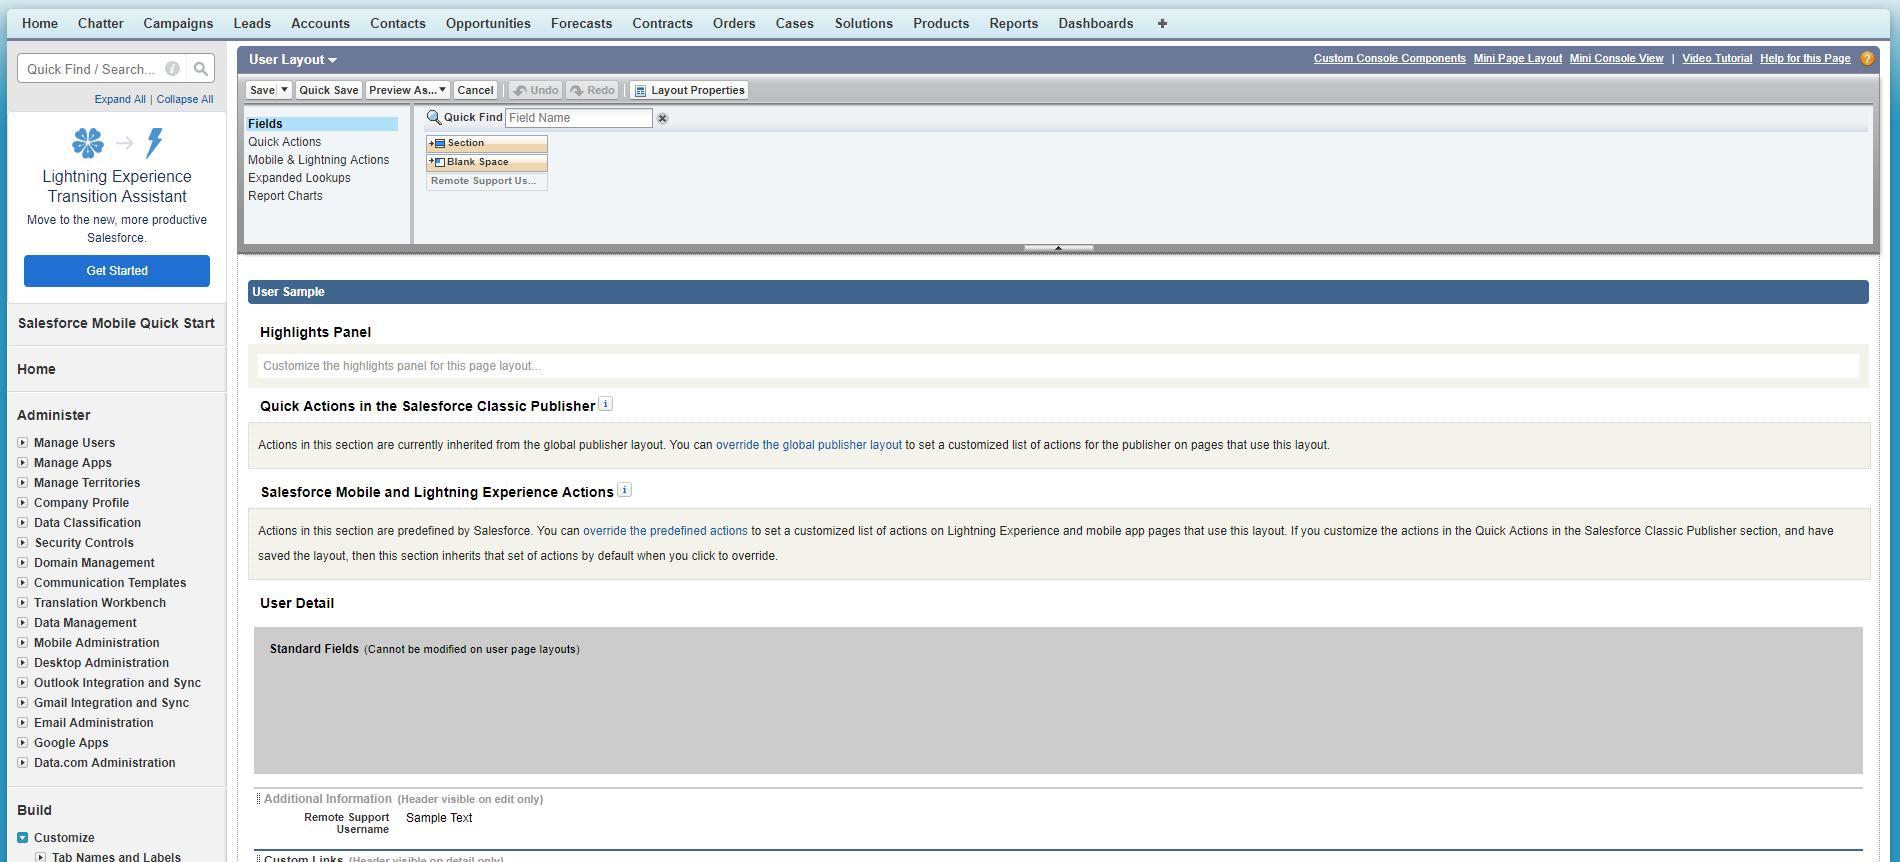 Configure Salesforce for Integration with BeyondTrust Remote